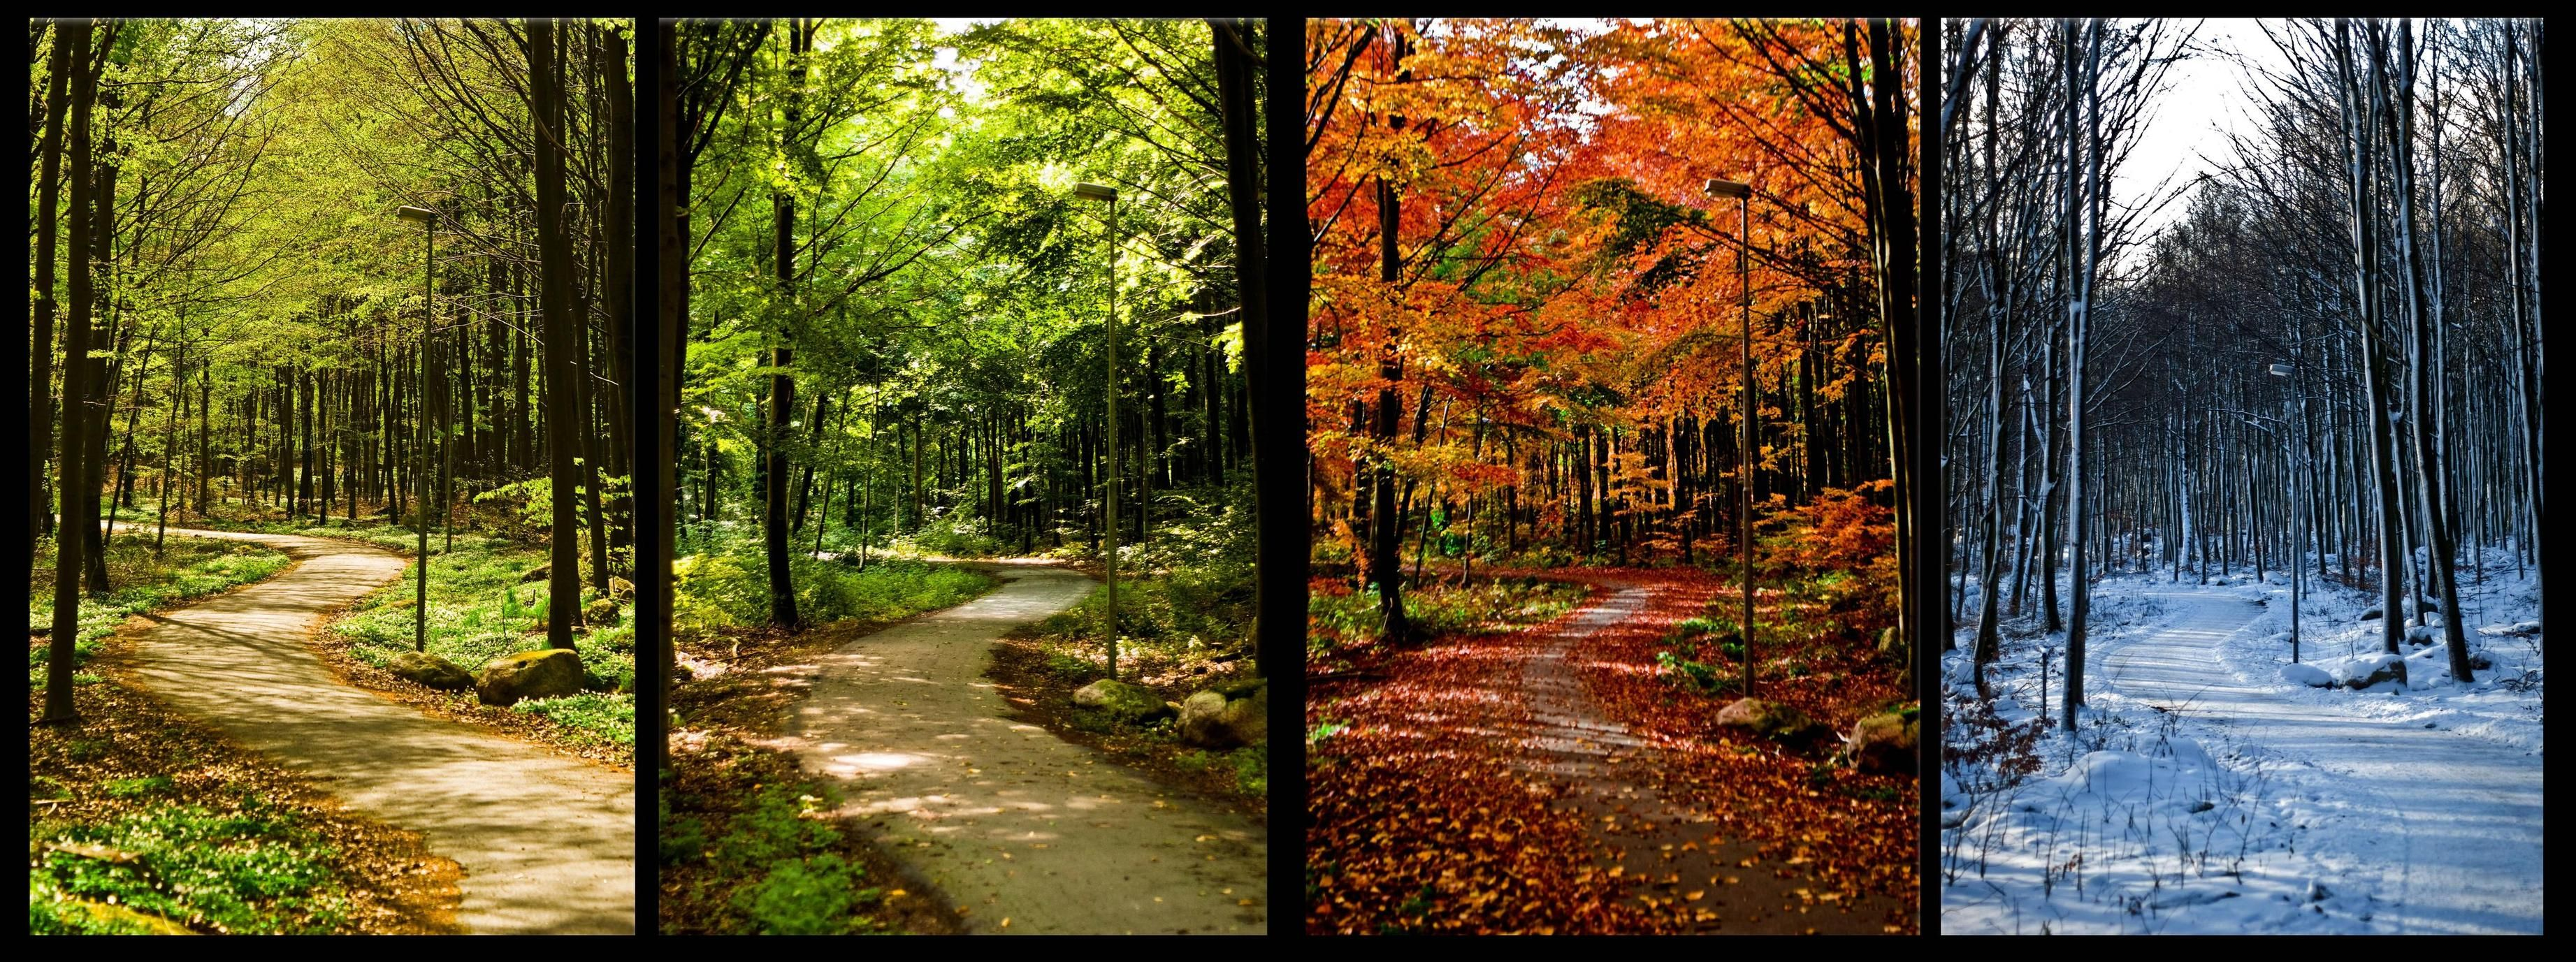 Same Place Four Seasons